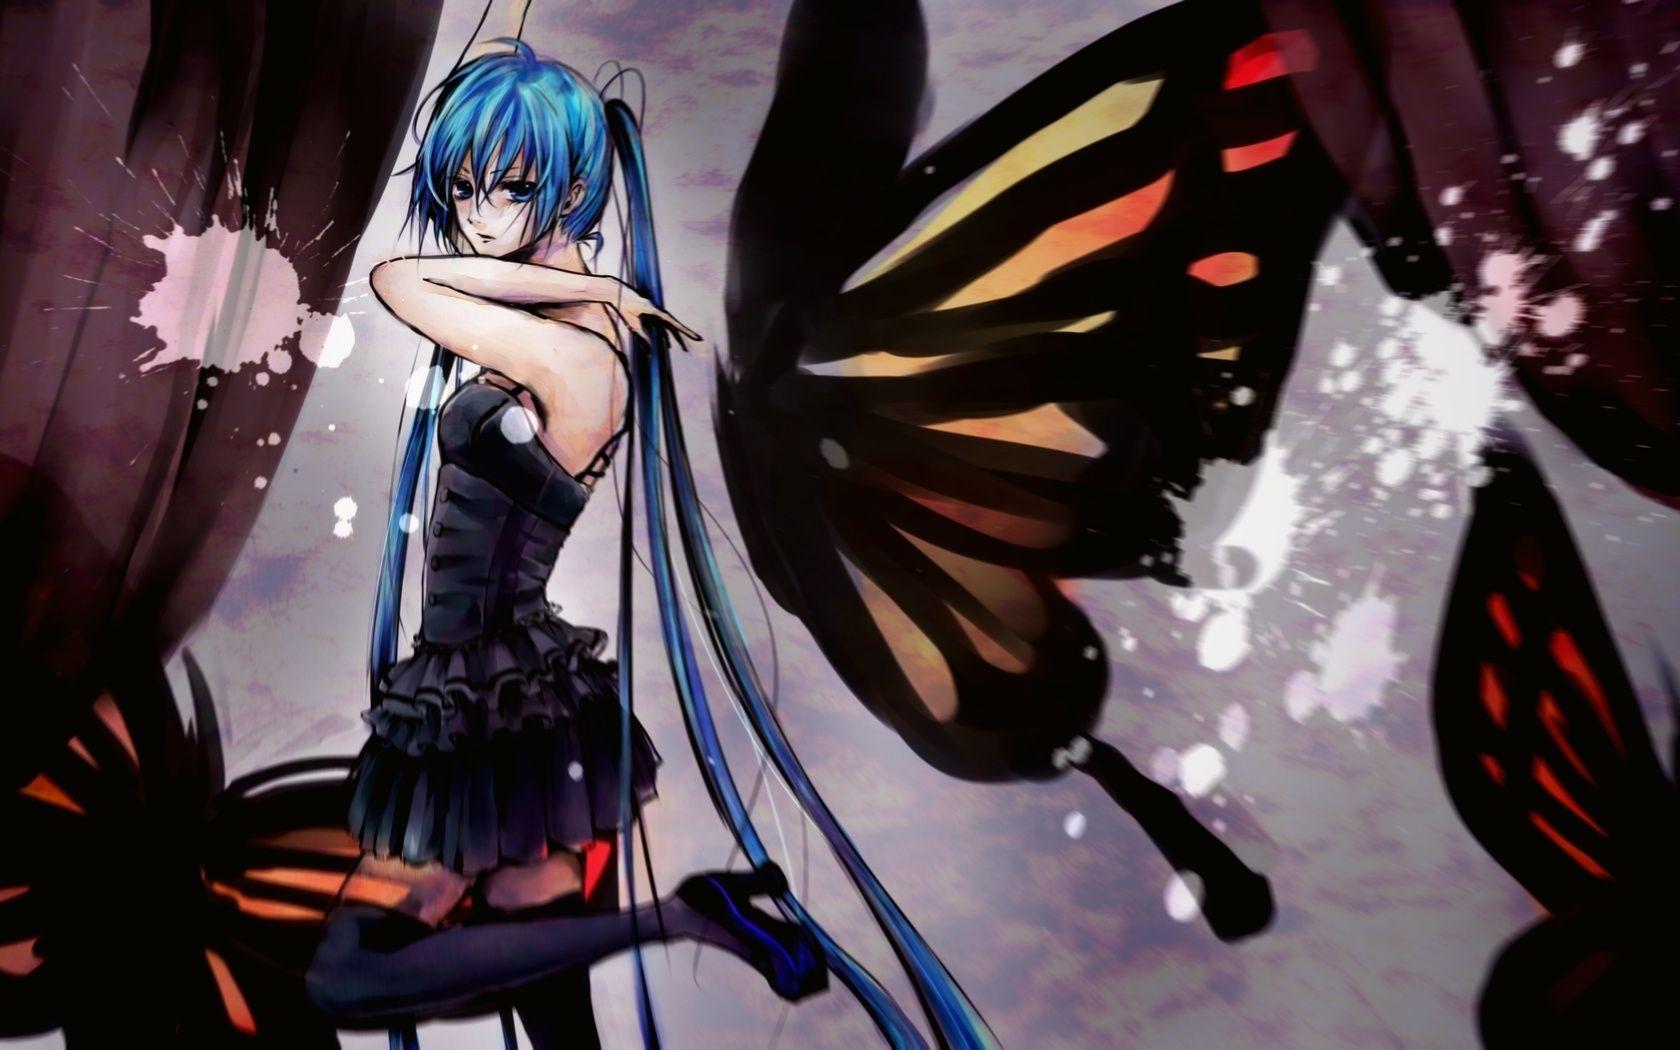 Pin on Anime Wings